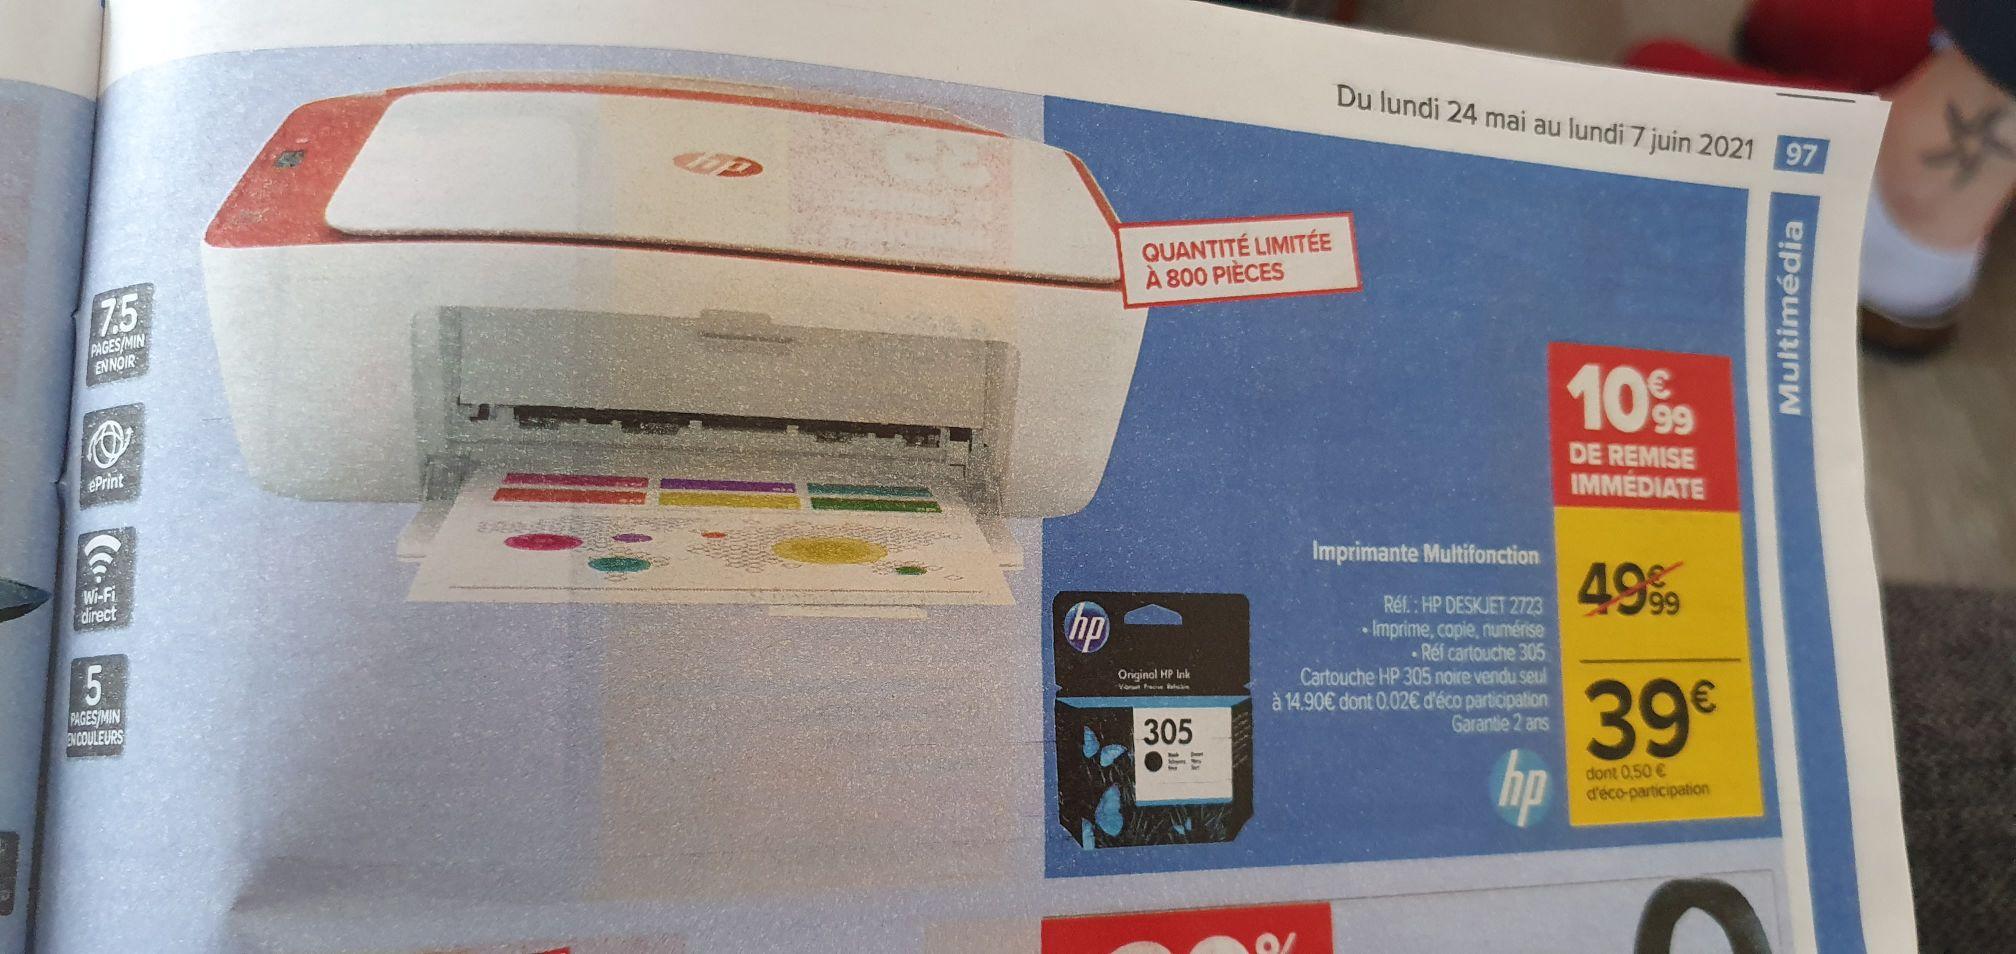 Imprimante jet d'encre multifonctions HP Deskjet 2723 - WiFi